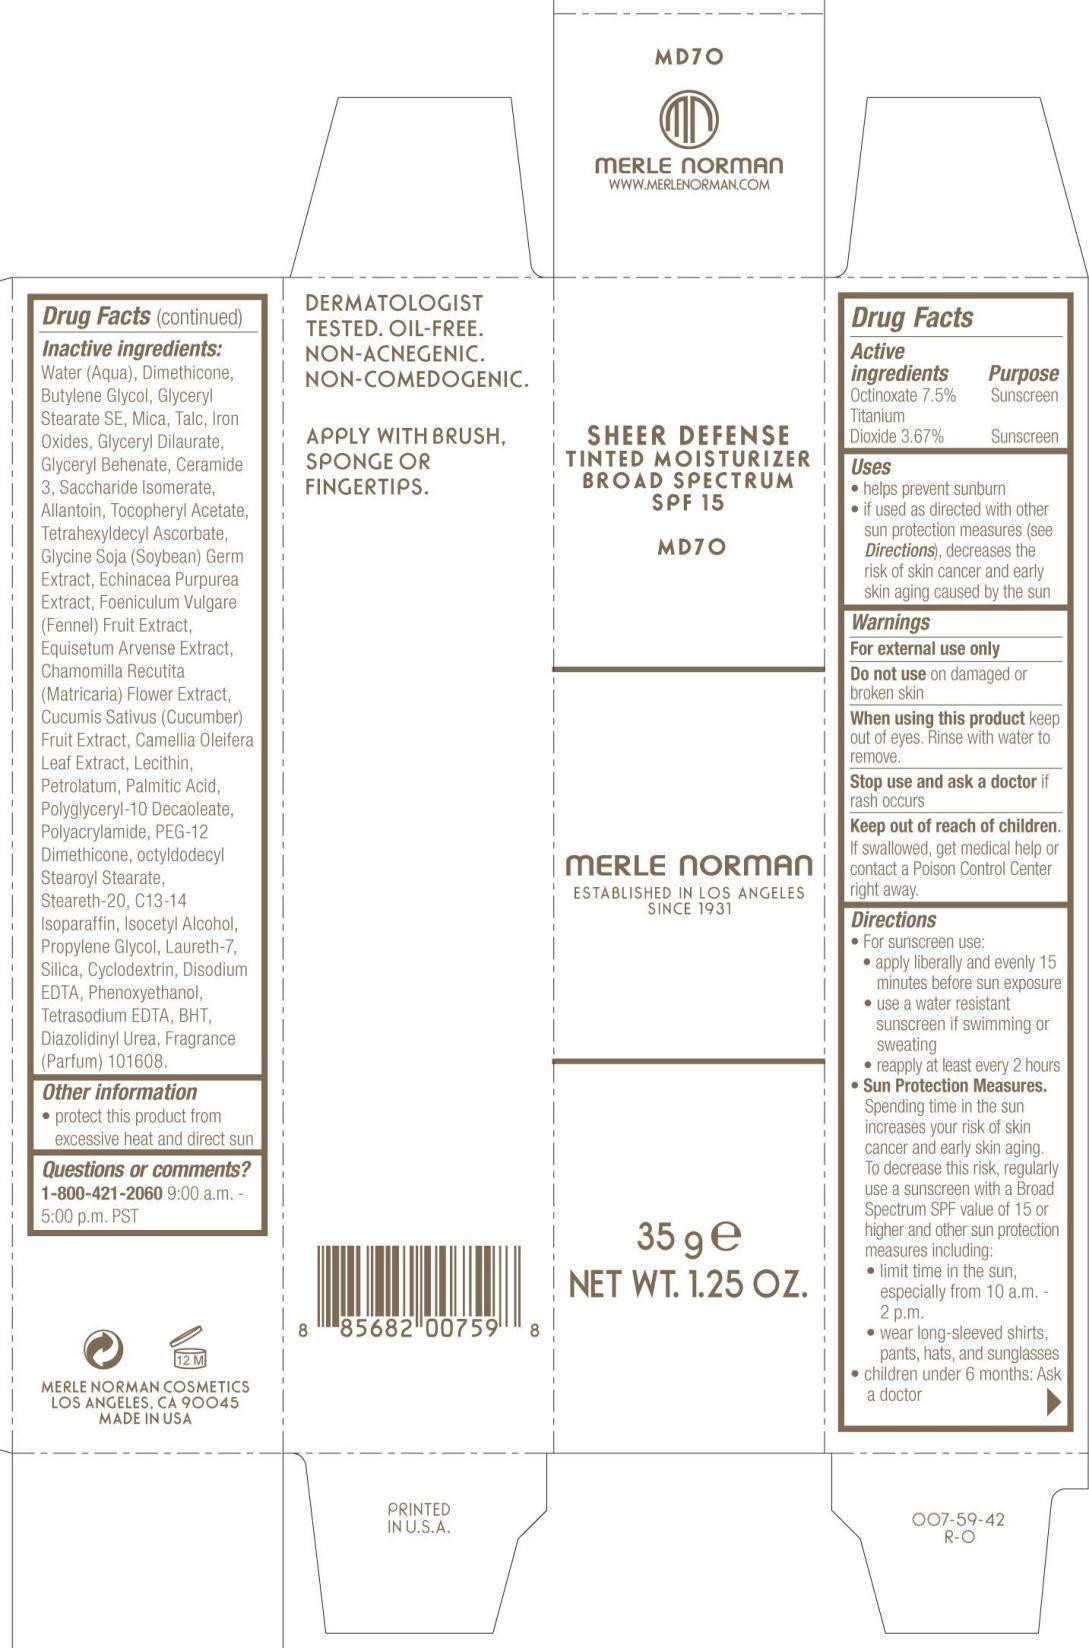 Sheer Defense Tinted Moisturizer Broad Spectrum Spf 15 Md 70 Merle Norman (Octinoxate, Titanium Dioxide) Liquid [Merle Norman Cosmetics, Inc.]